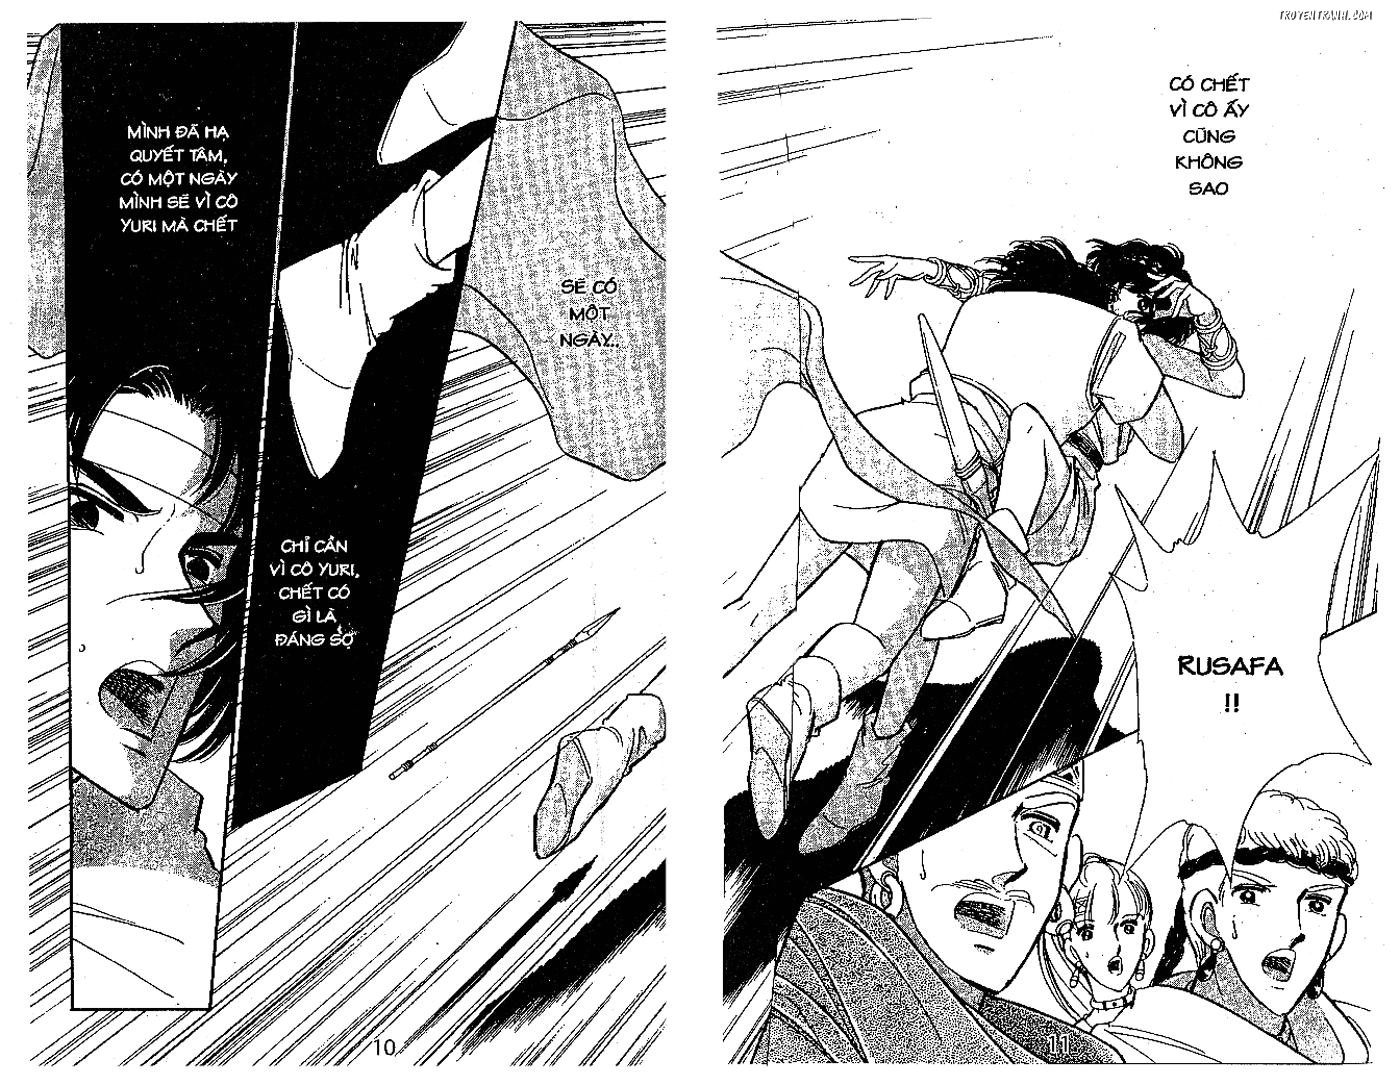 Sora wa Akai Kawa no Hotori - Dòng sông huyền bí Chapter 74 - Trang 10